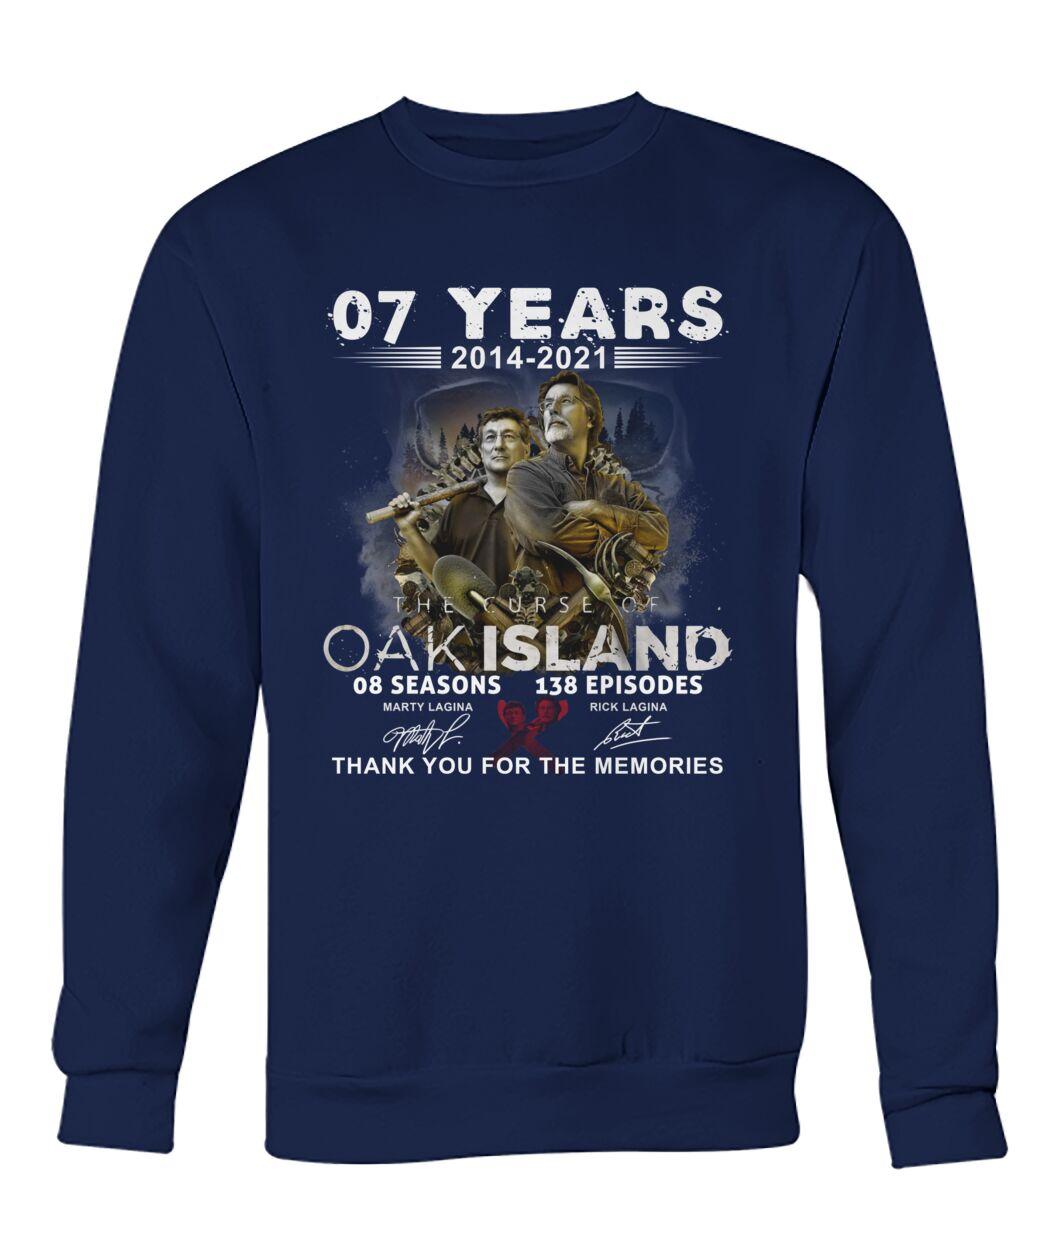 07 years 2014 2021 OAK island 08 seasons thank you for memories shirt 13